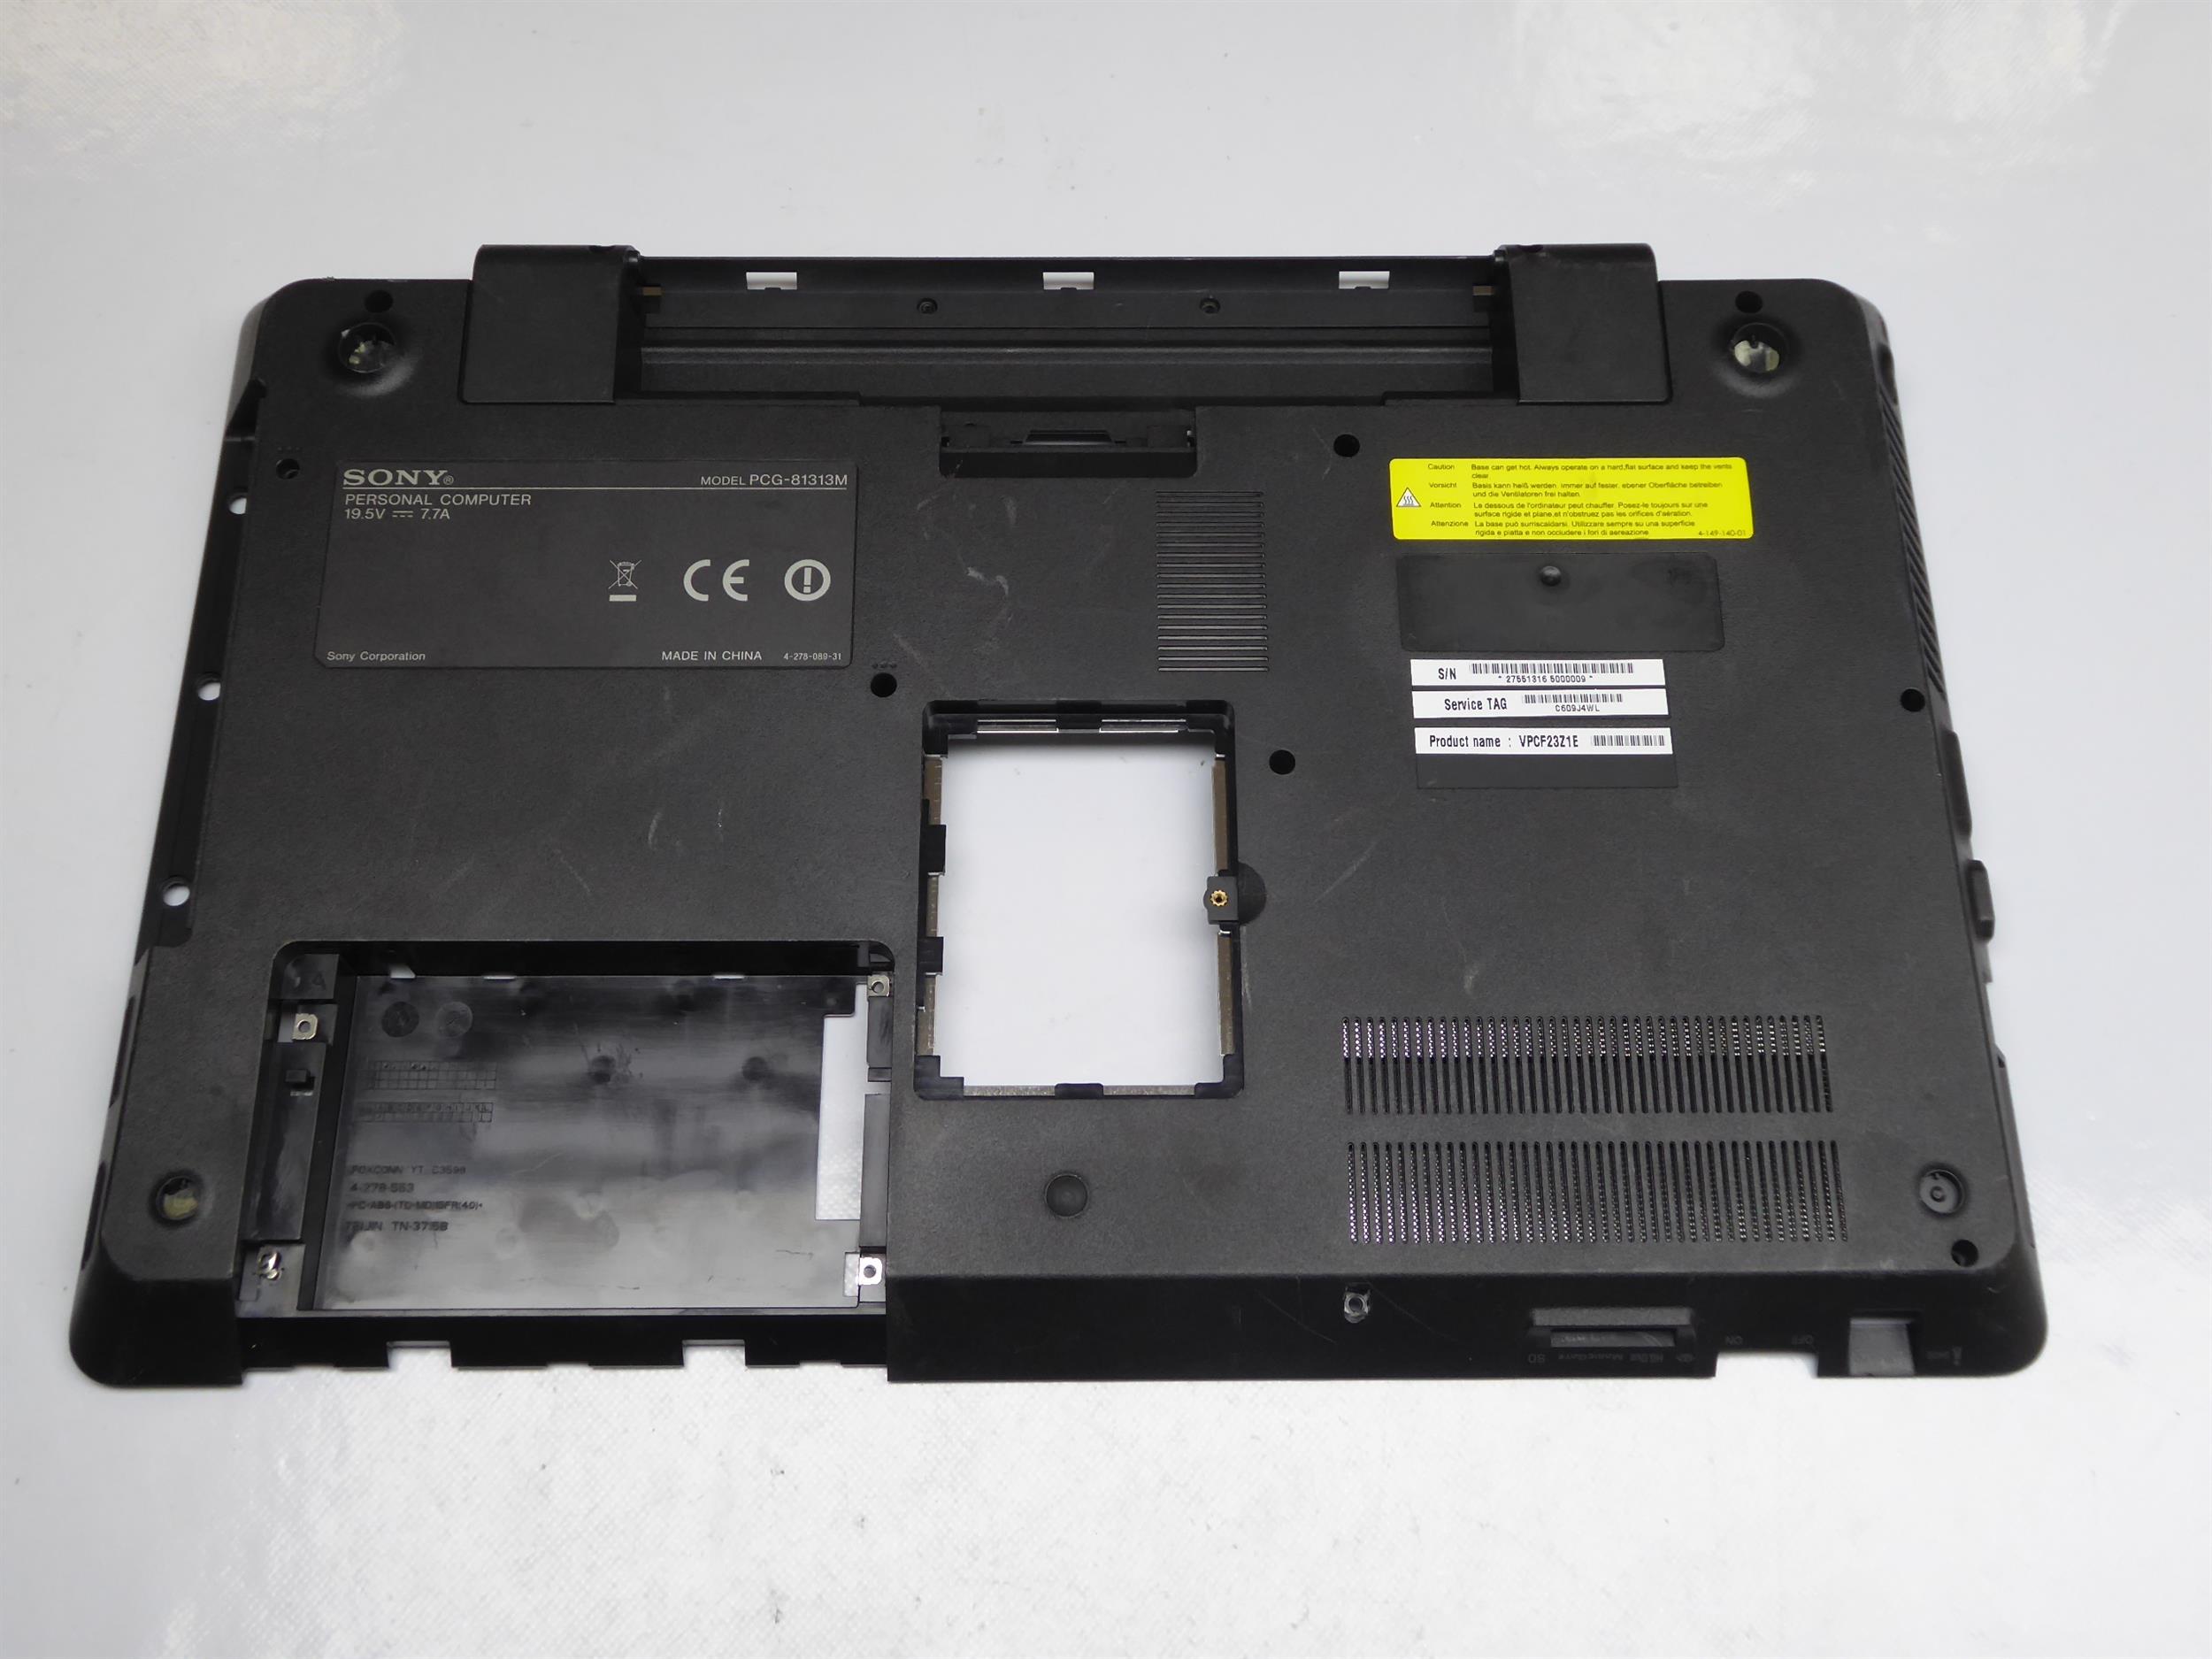 Sony-PCG-81313M-Gehaeuse-Unterteil-Schale-012-000A-6508-B-3893